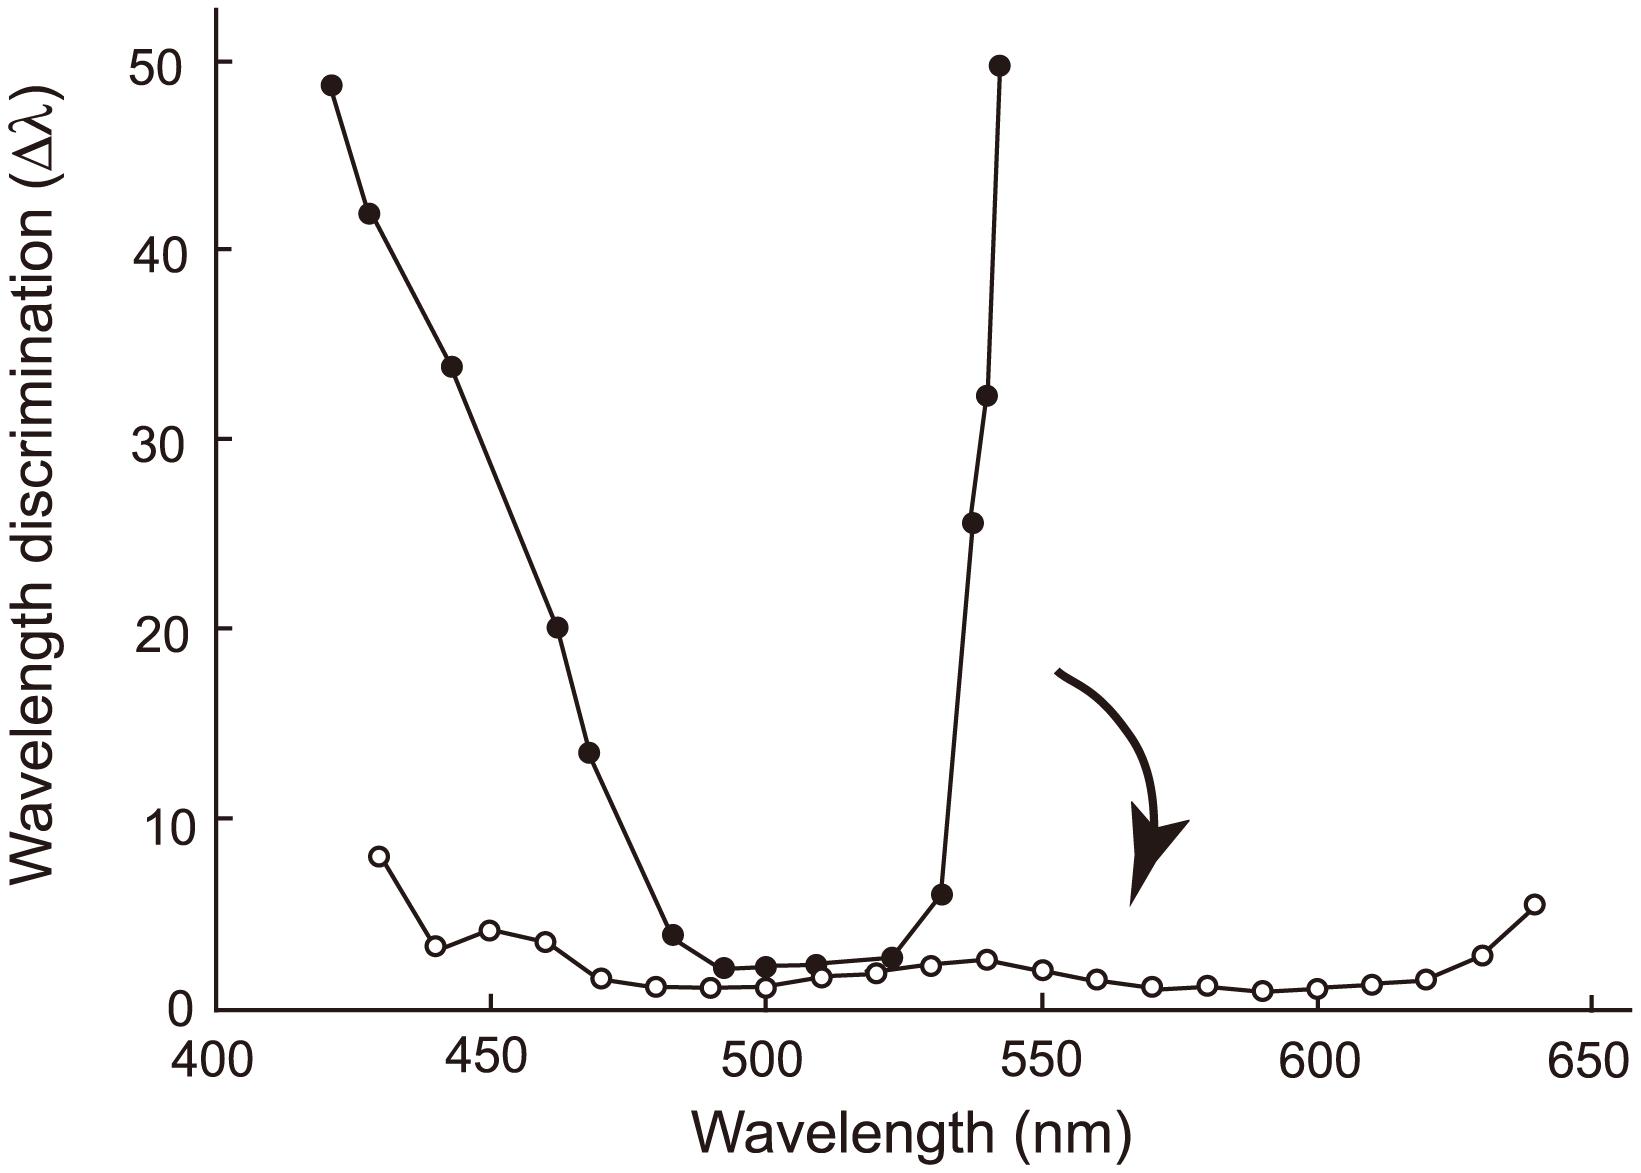 Evolutionary change in the wavelength discrimination by human ancestors.